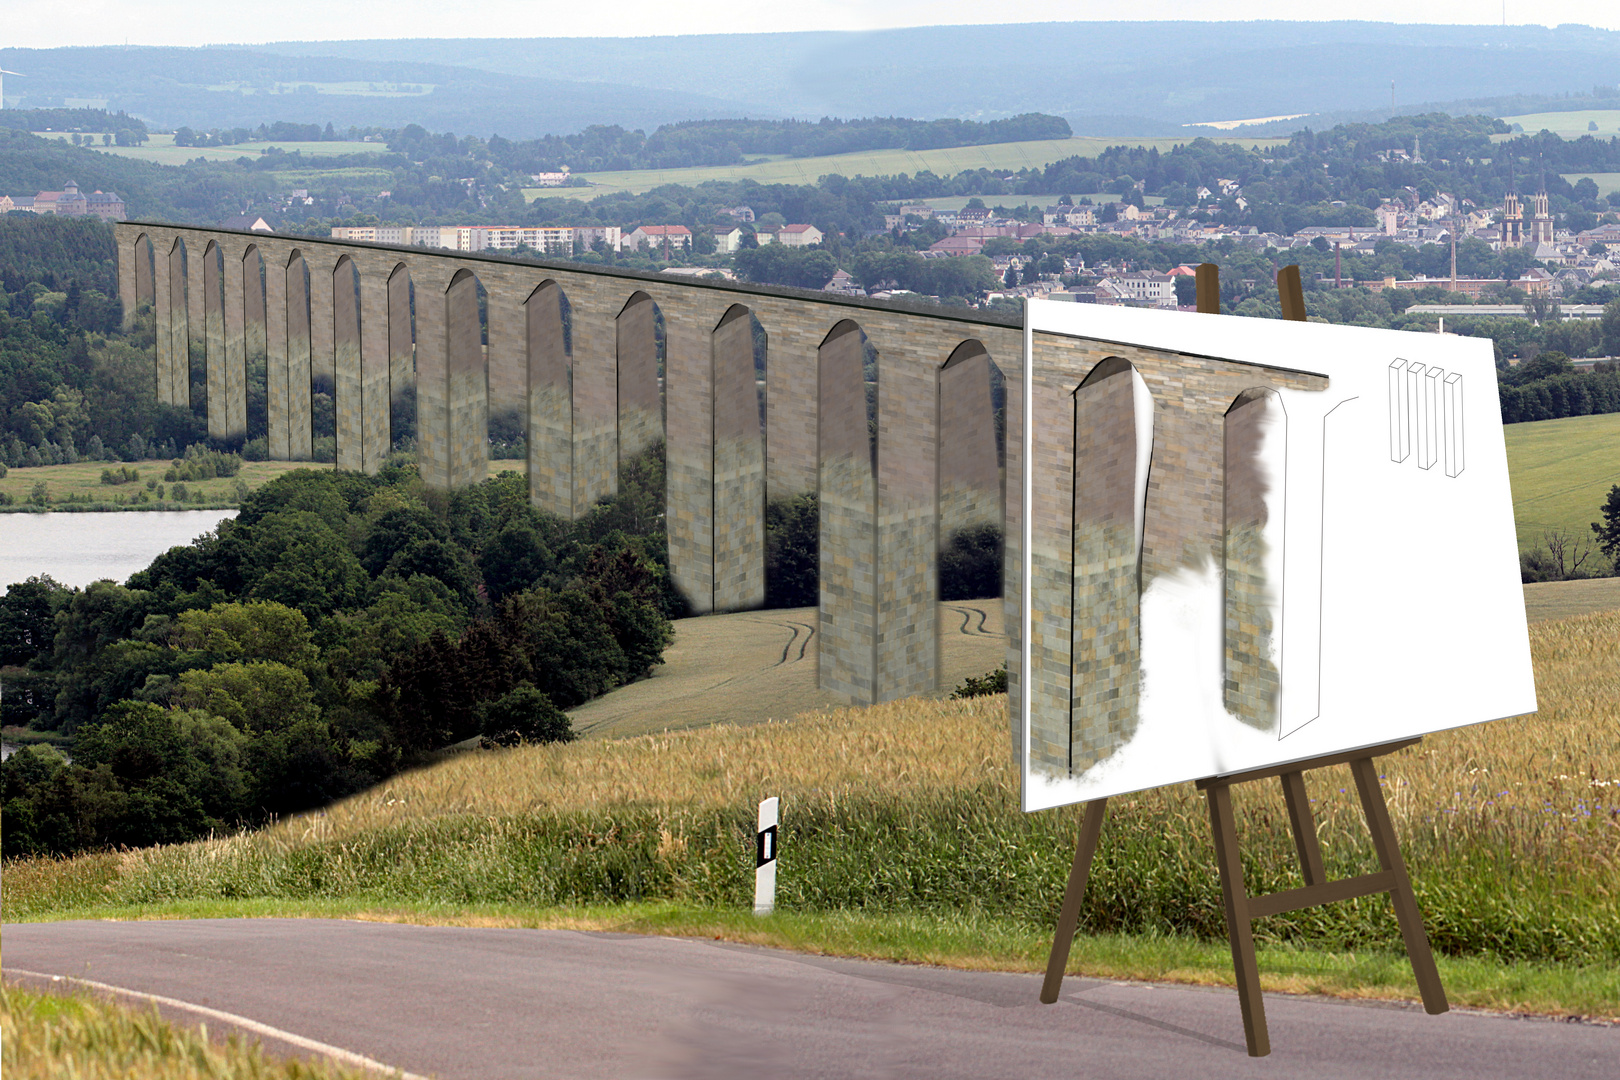 Wieviel Brückenpfeiler sind zu sehen?